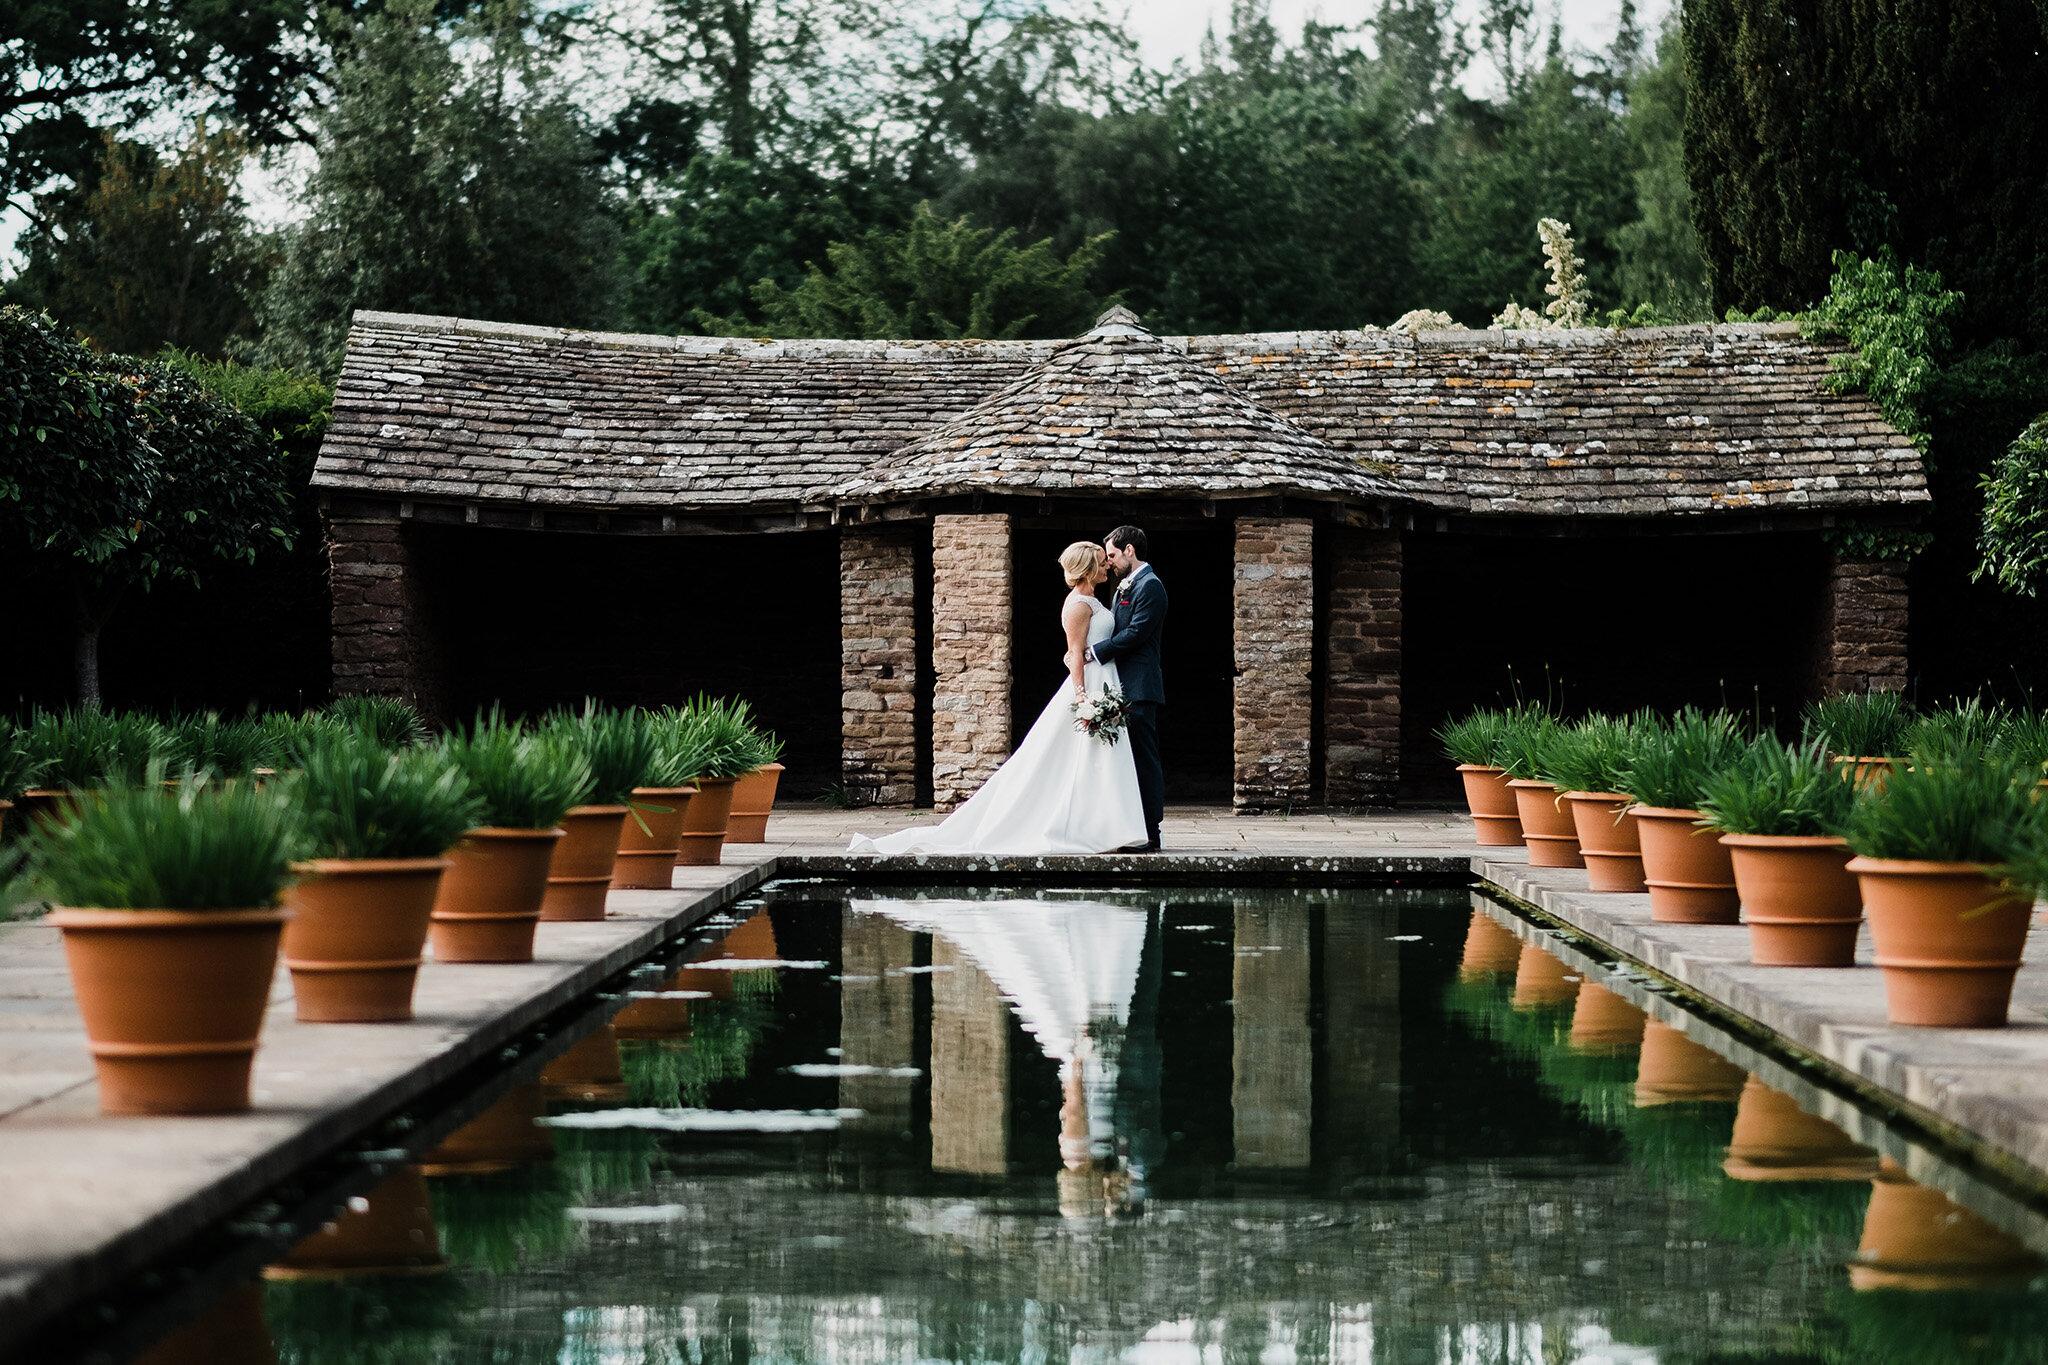 Scott-Stockwell-Photography-wedding-photographer-hampton-court-castle.jpg